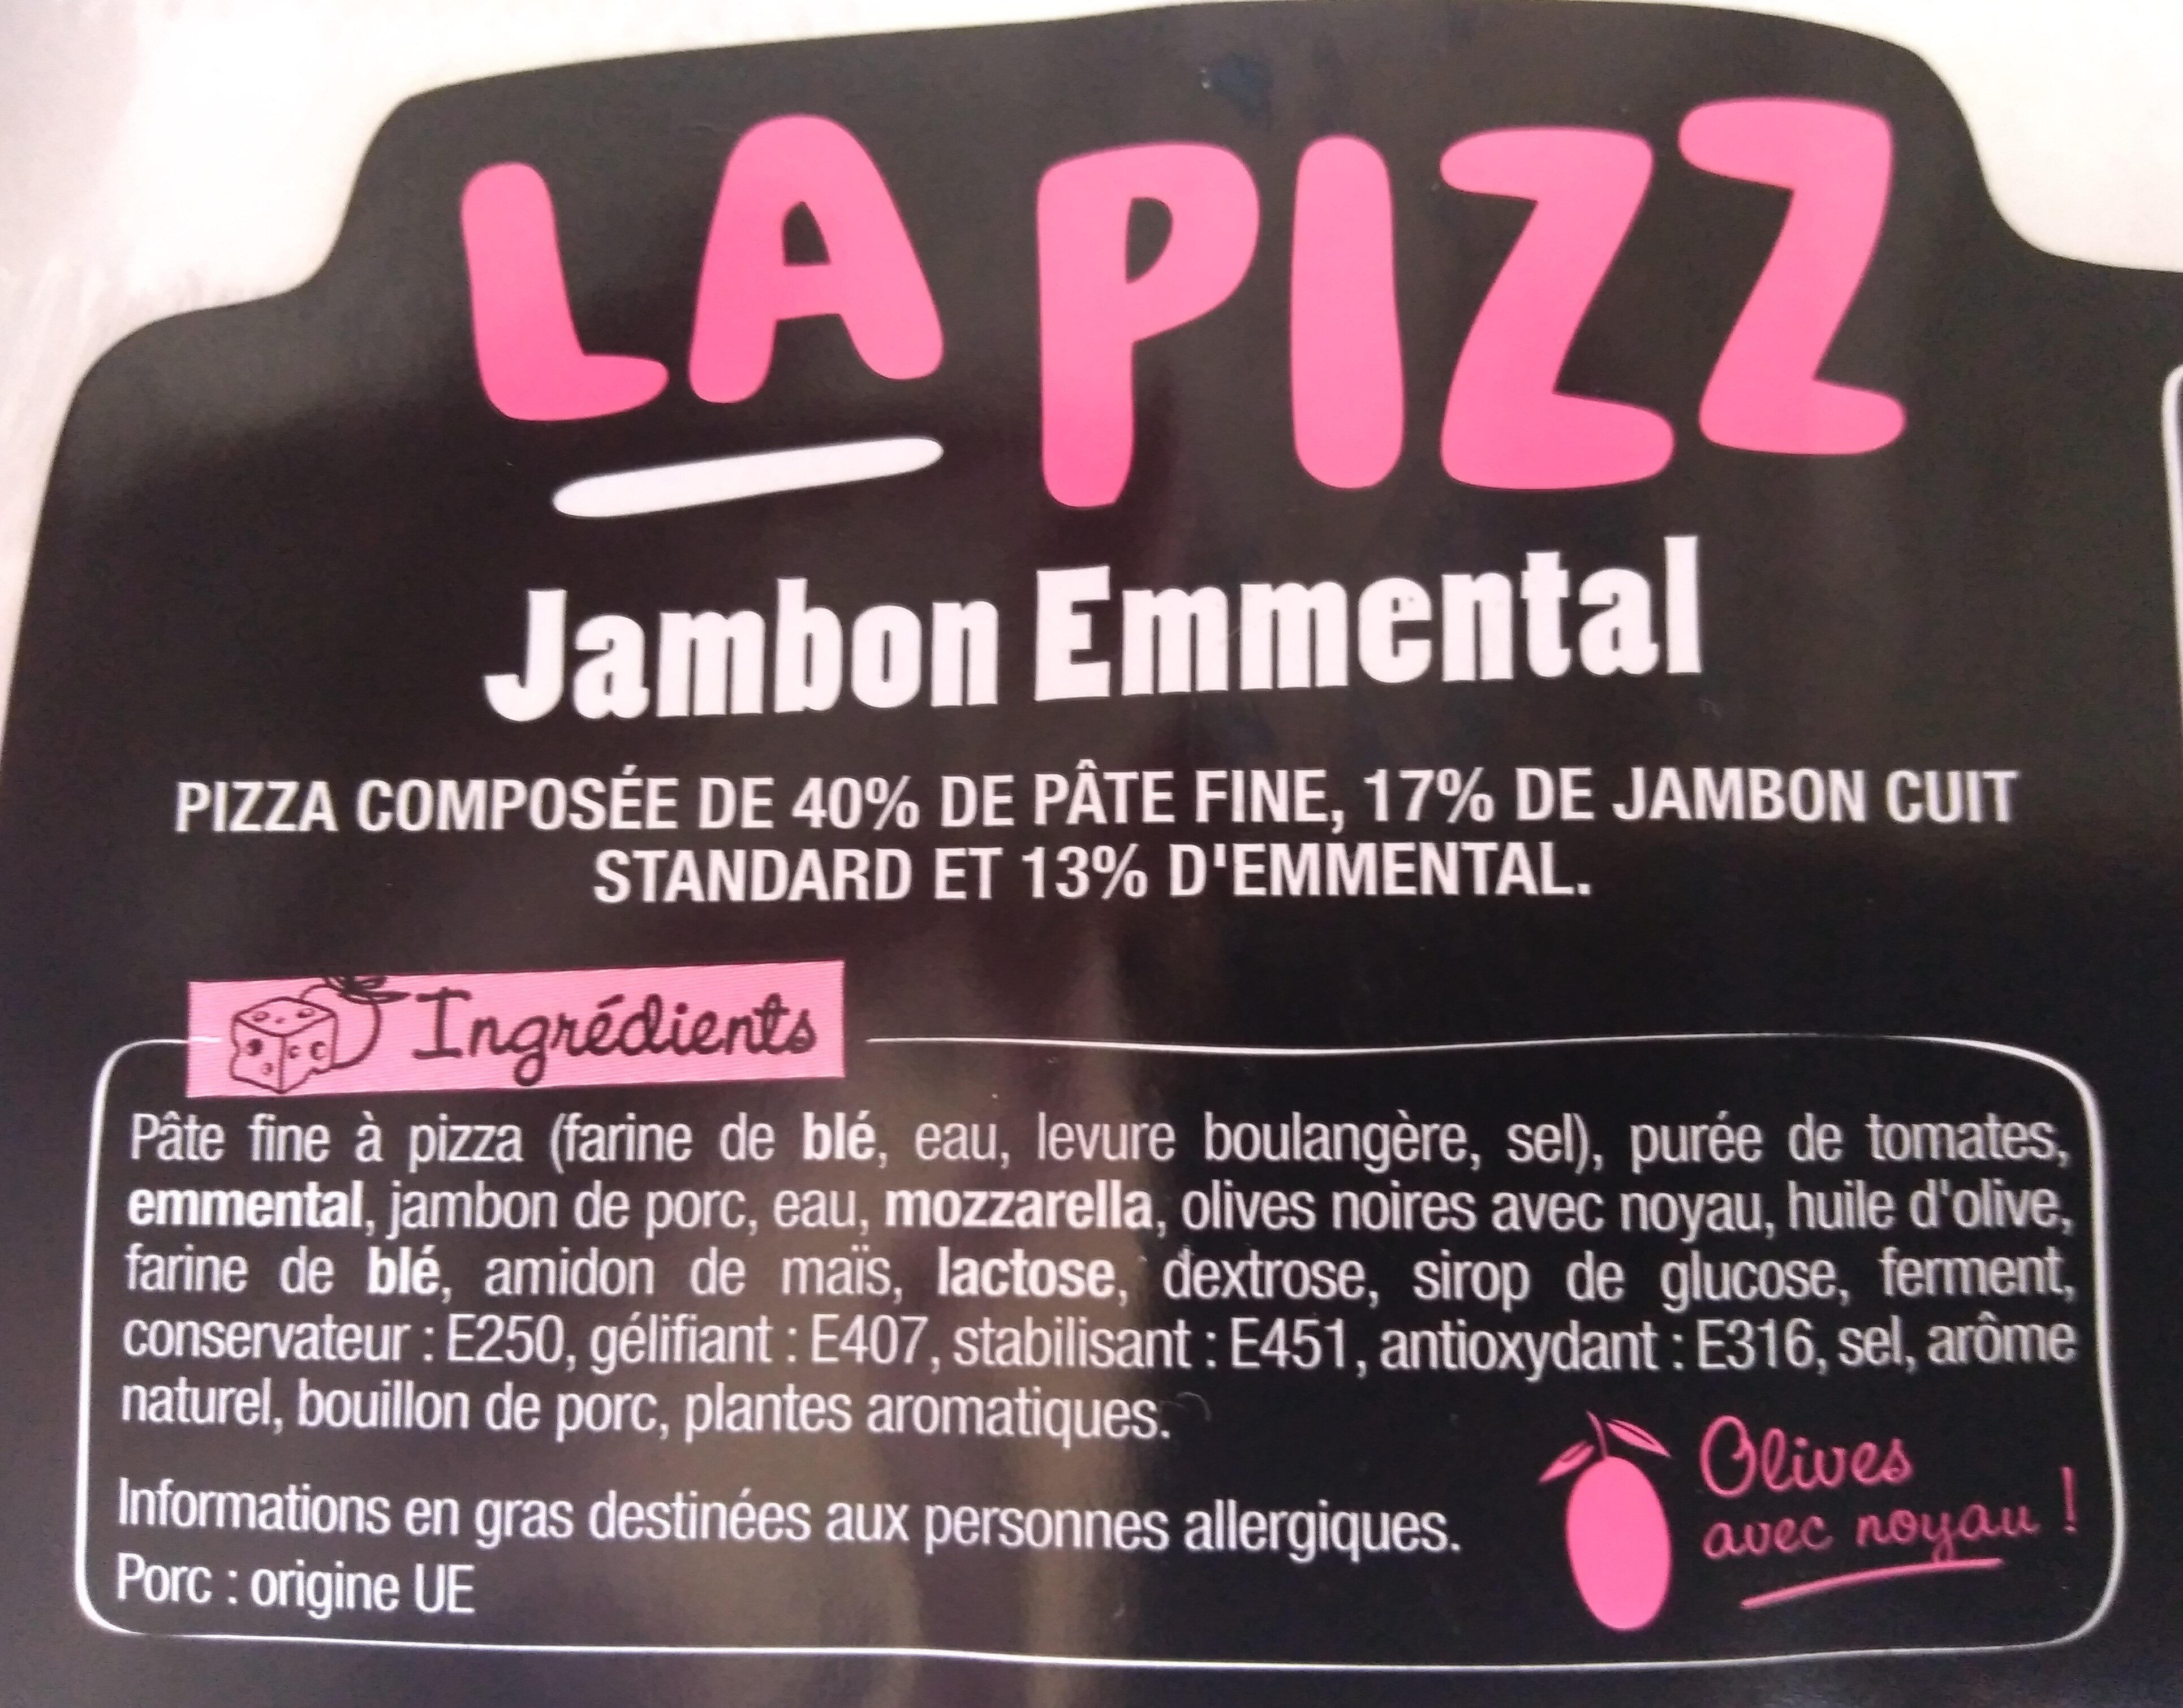 La Pizz - Jambon Emmental - Ingrediënten